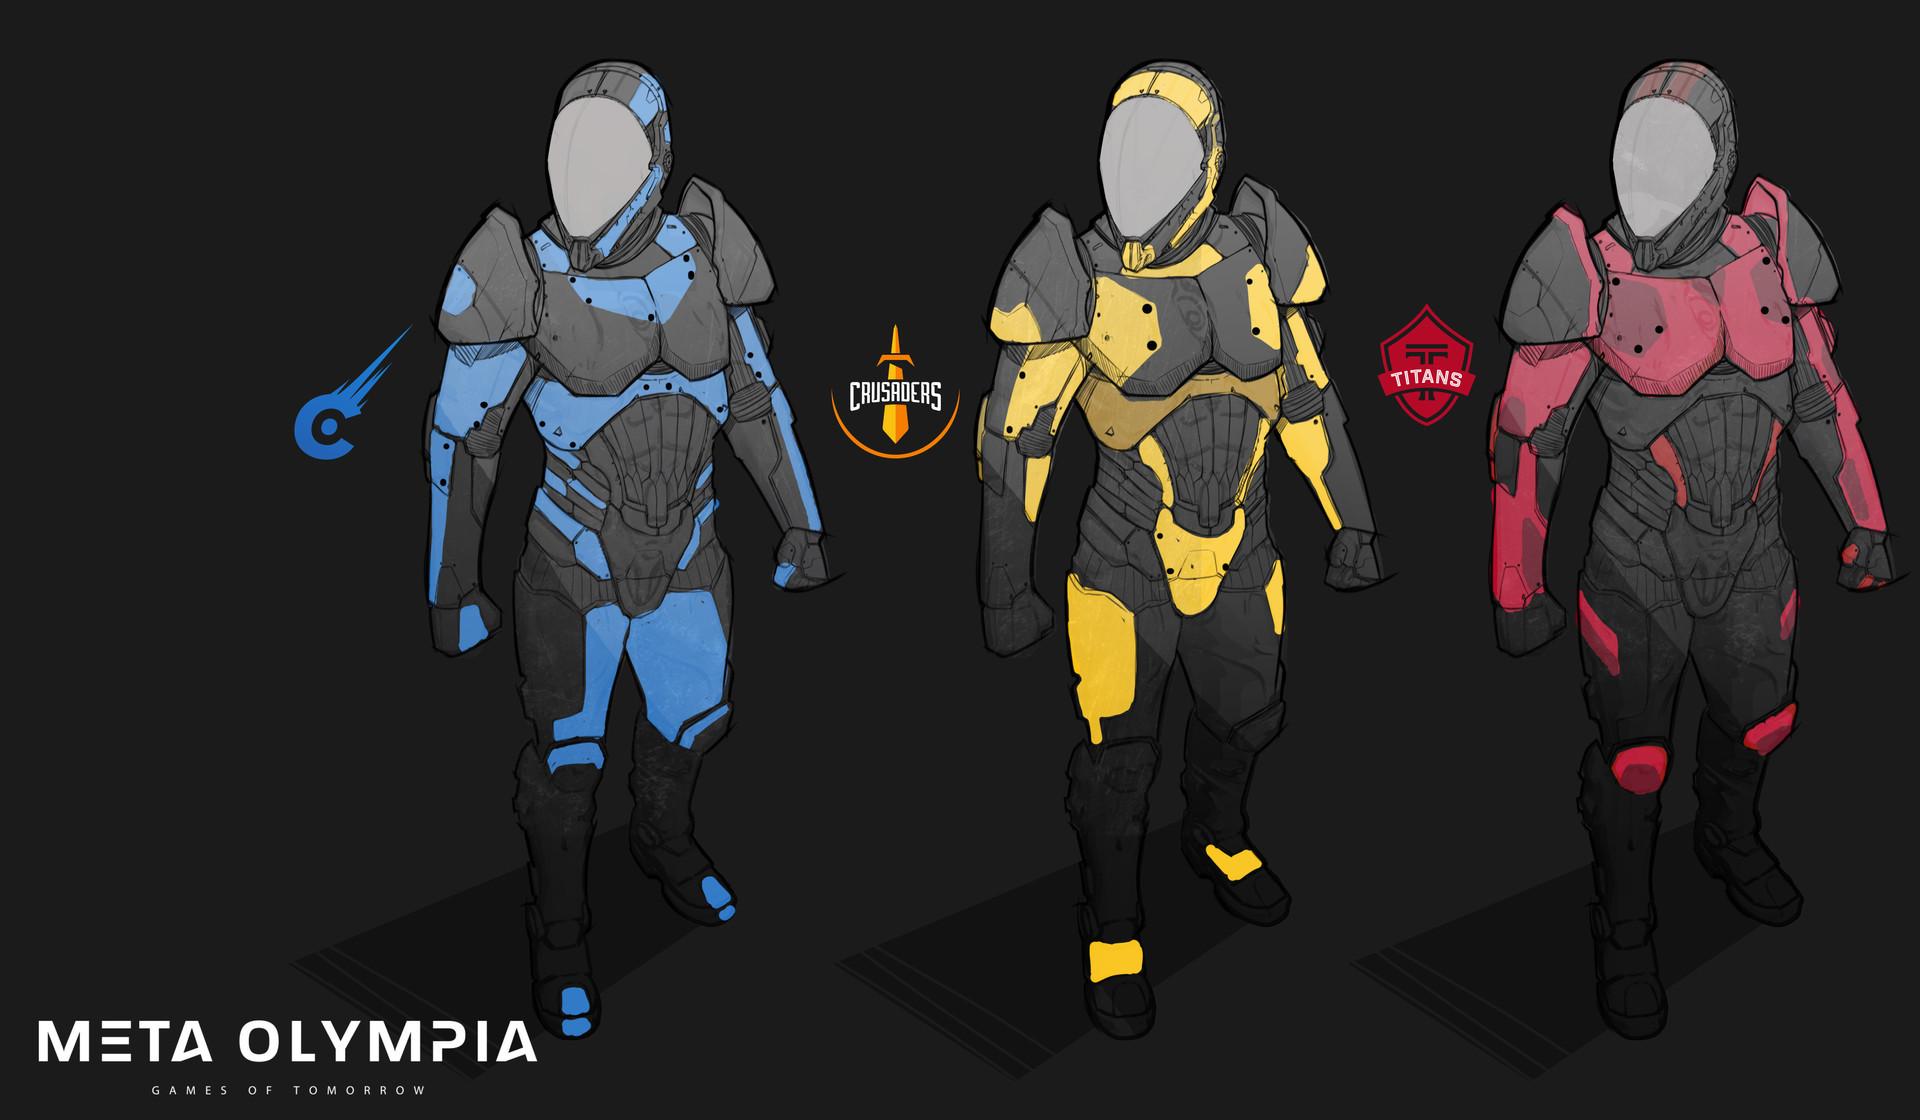 Meta olympia evsuit armor 2